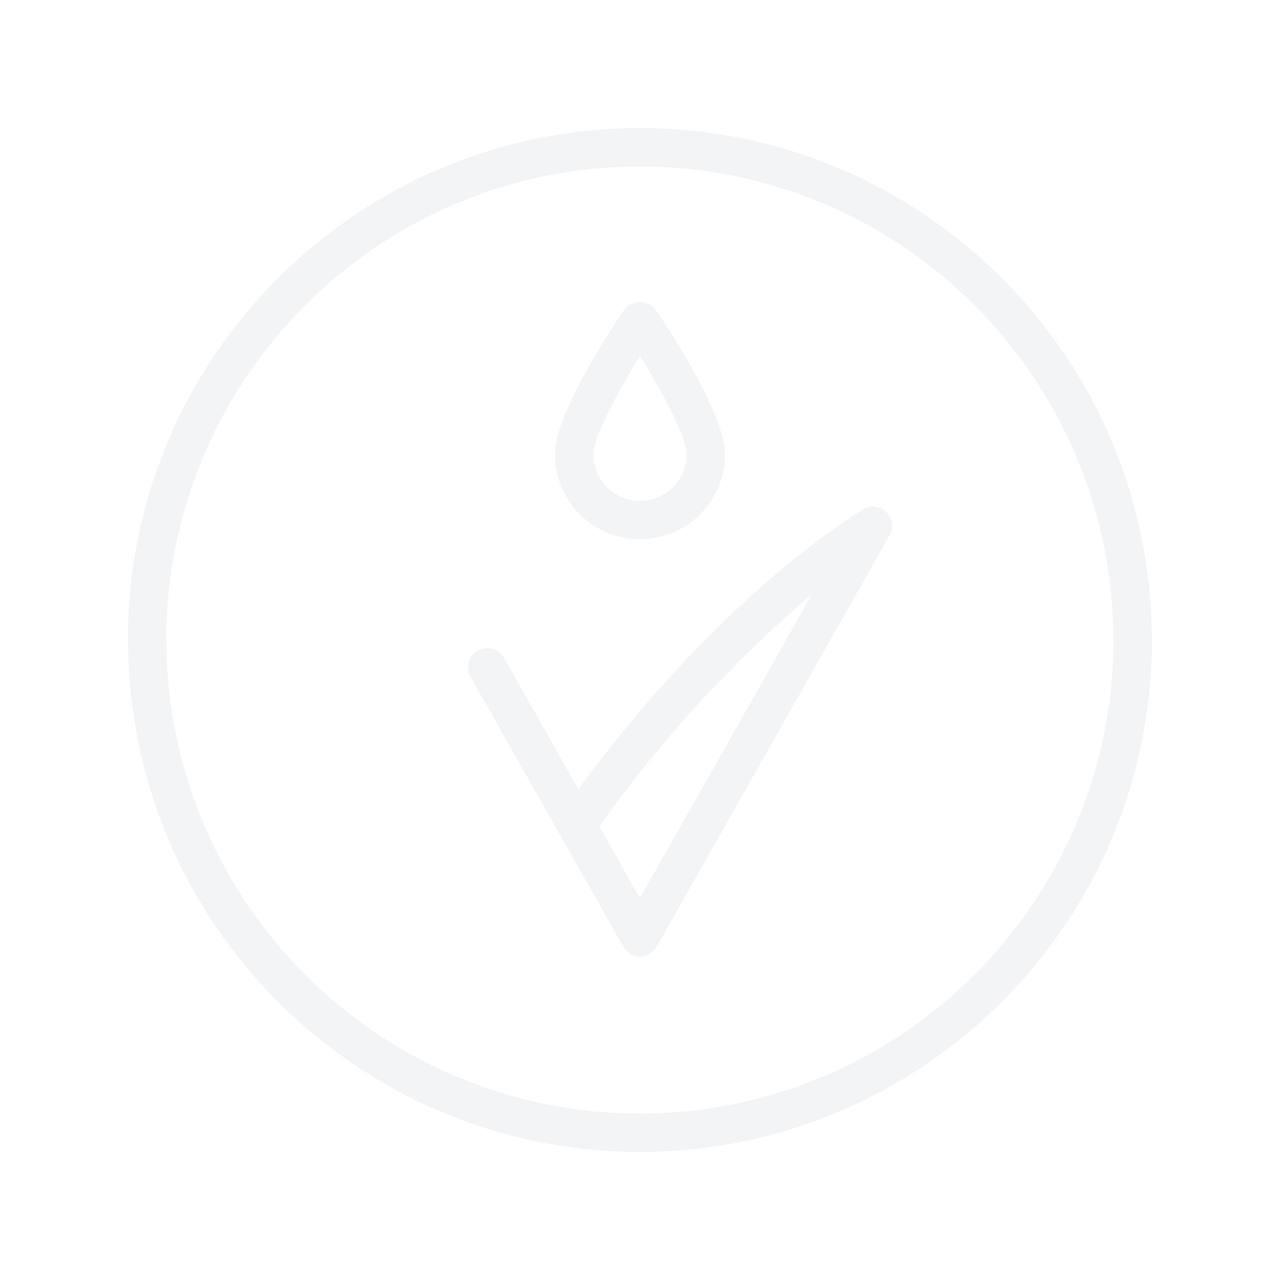 SWISSDENT Profi Gentle Extra Soft Toothbrush зубная щетка, экстра мягкая